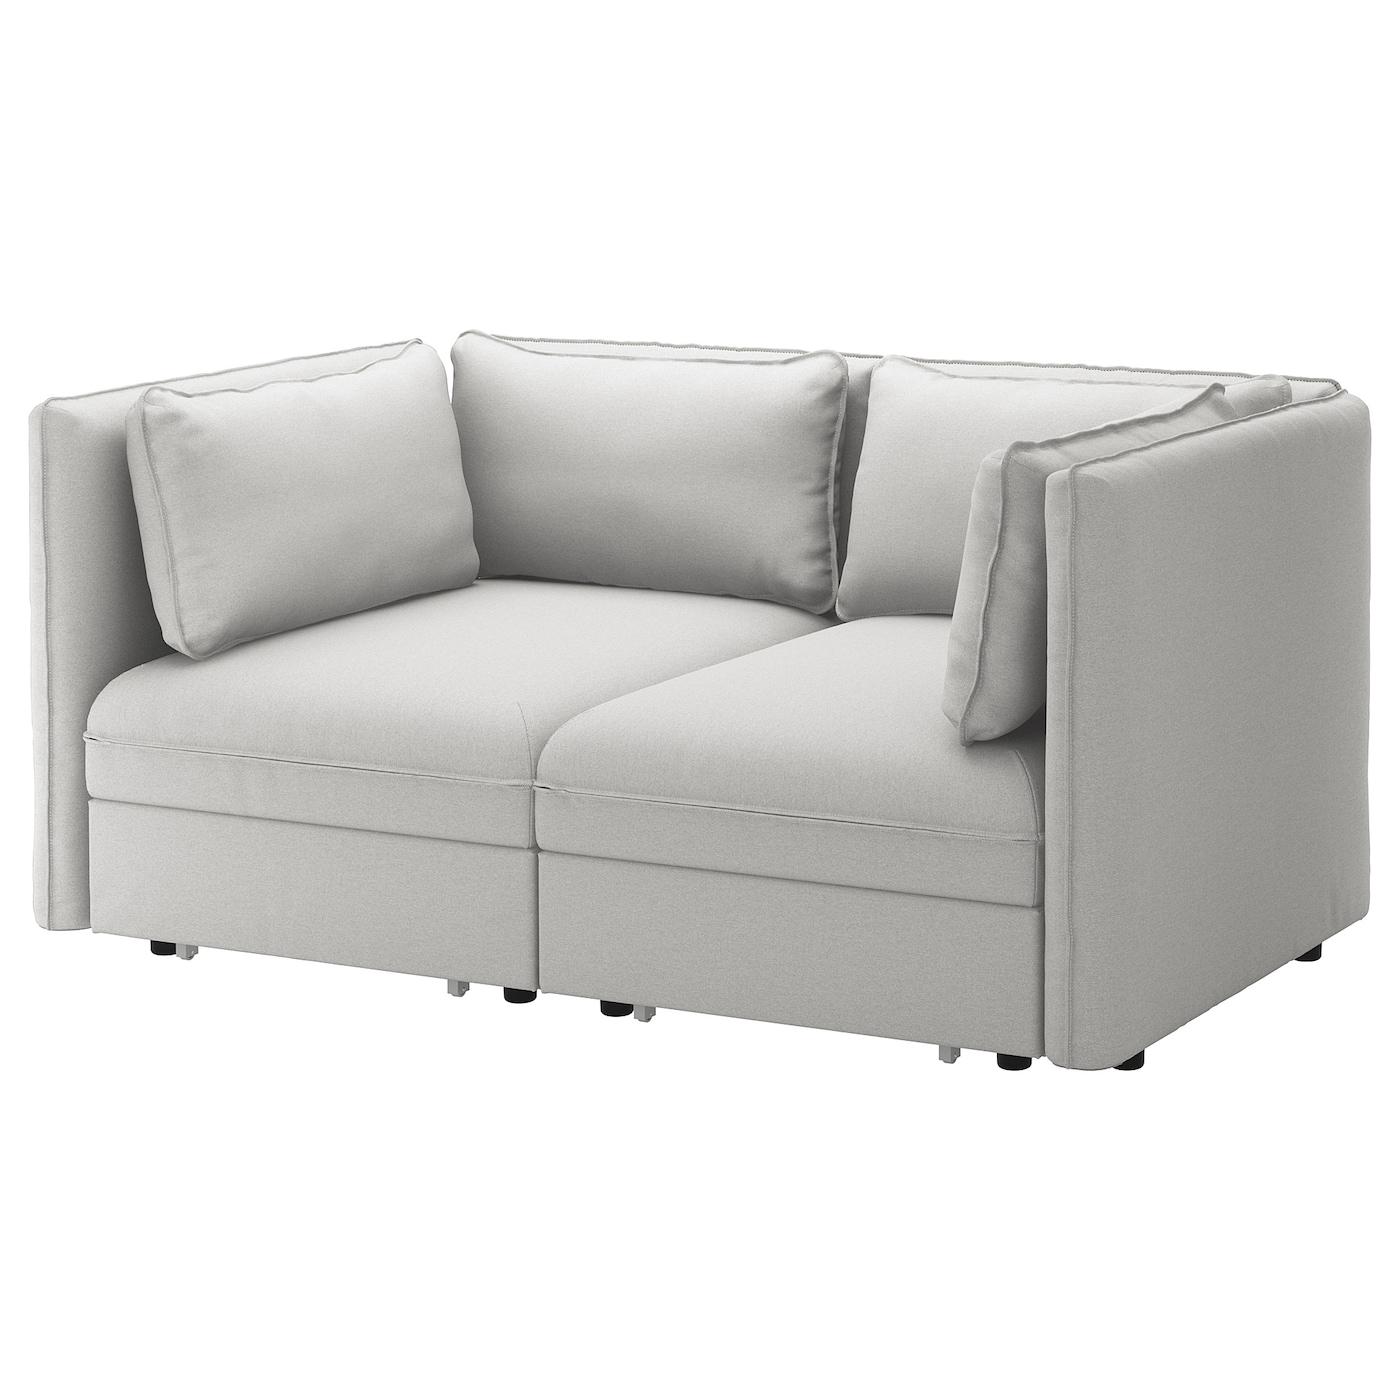 Fauteuils Canapes Convertibles Confortable Pas Cher Ikea